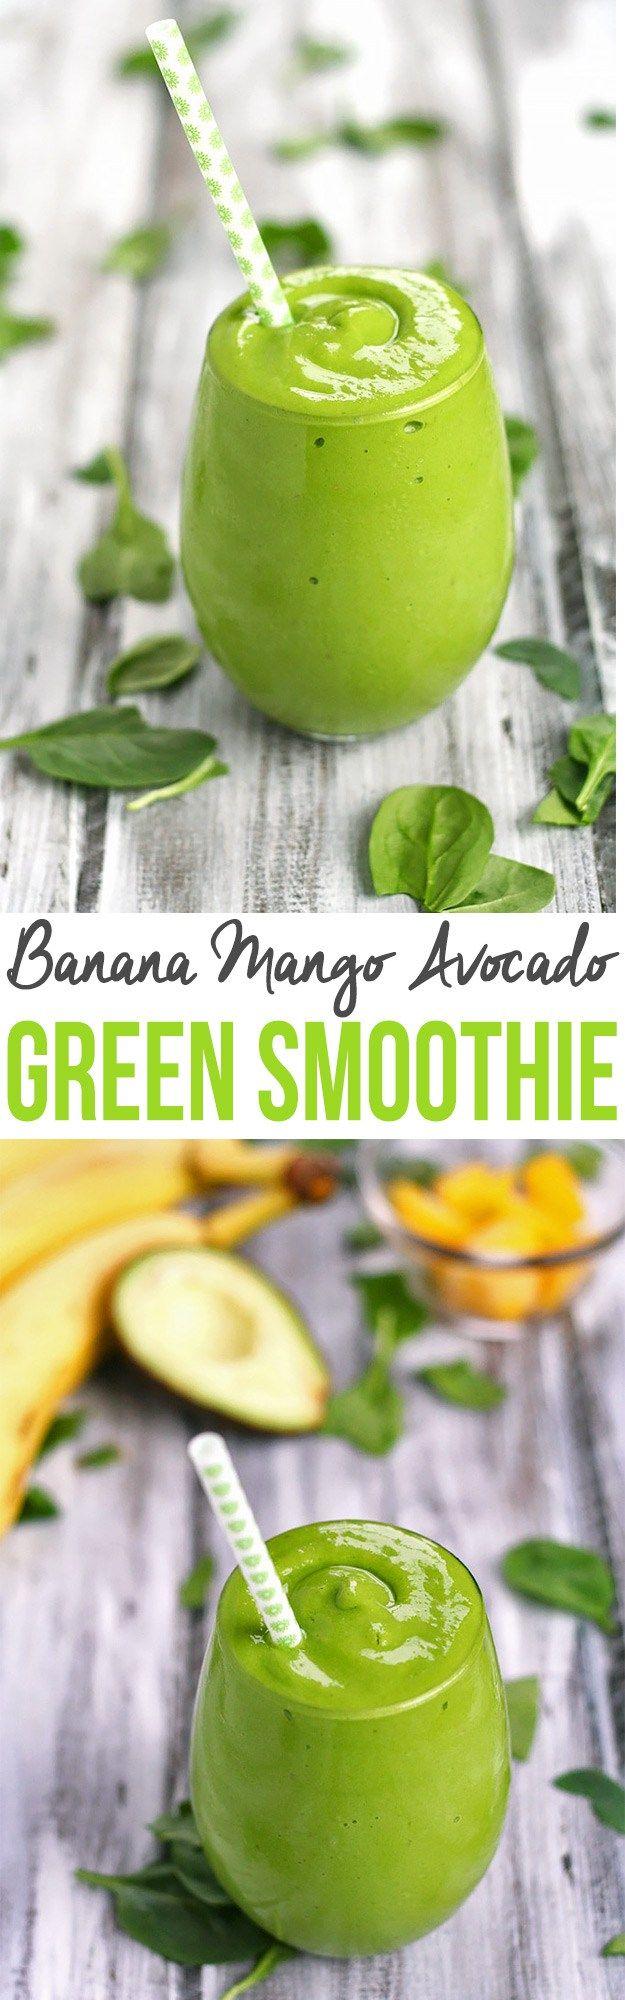 25+ Best Ideas About Mango Smoothie Healthy On Pinterest  Mango Smoothies,  Morning Energy Smoothie And Mango Banana Smoothie